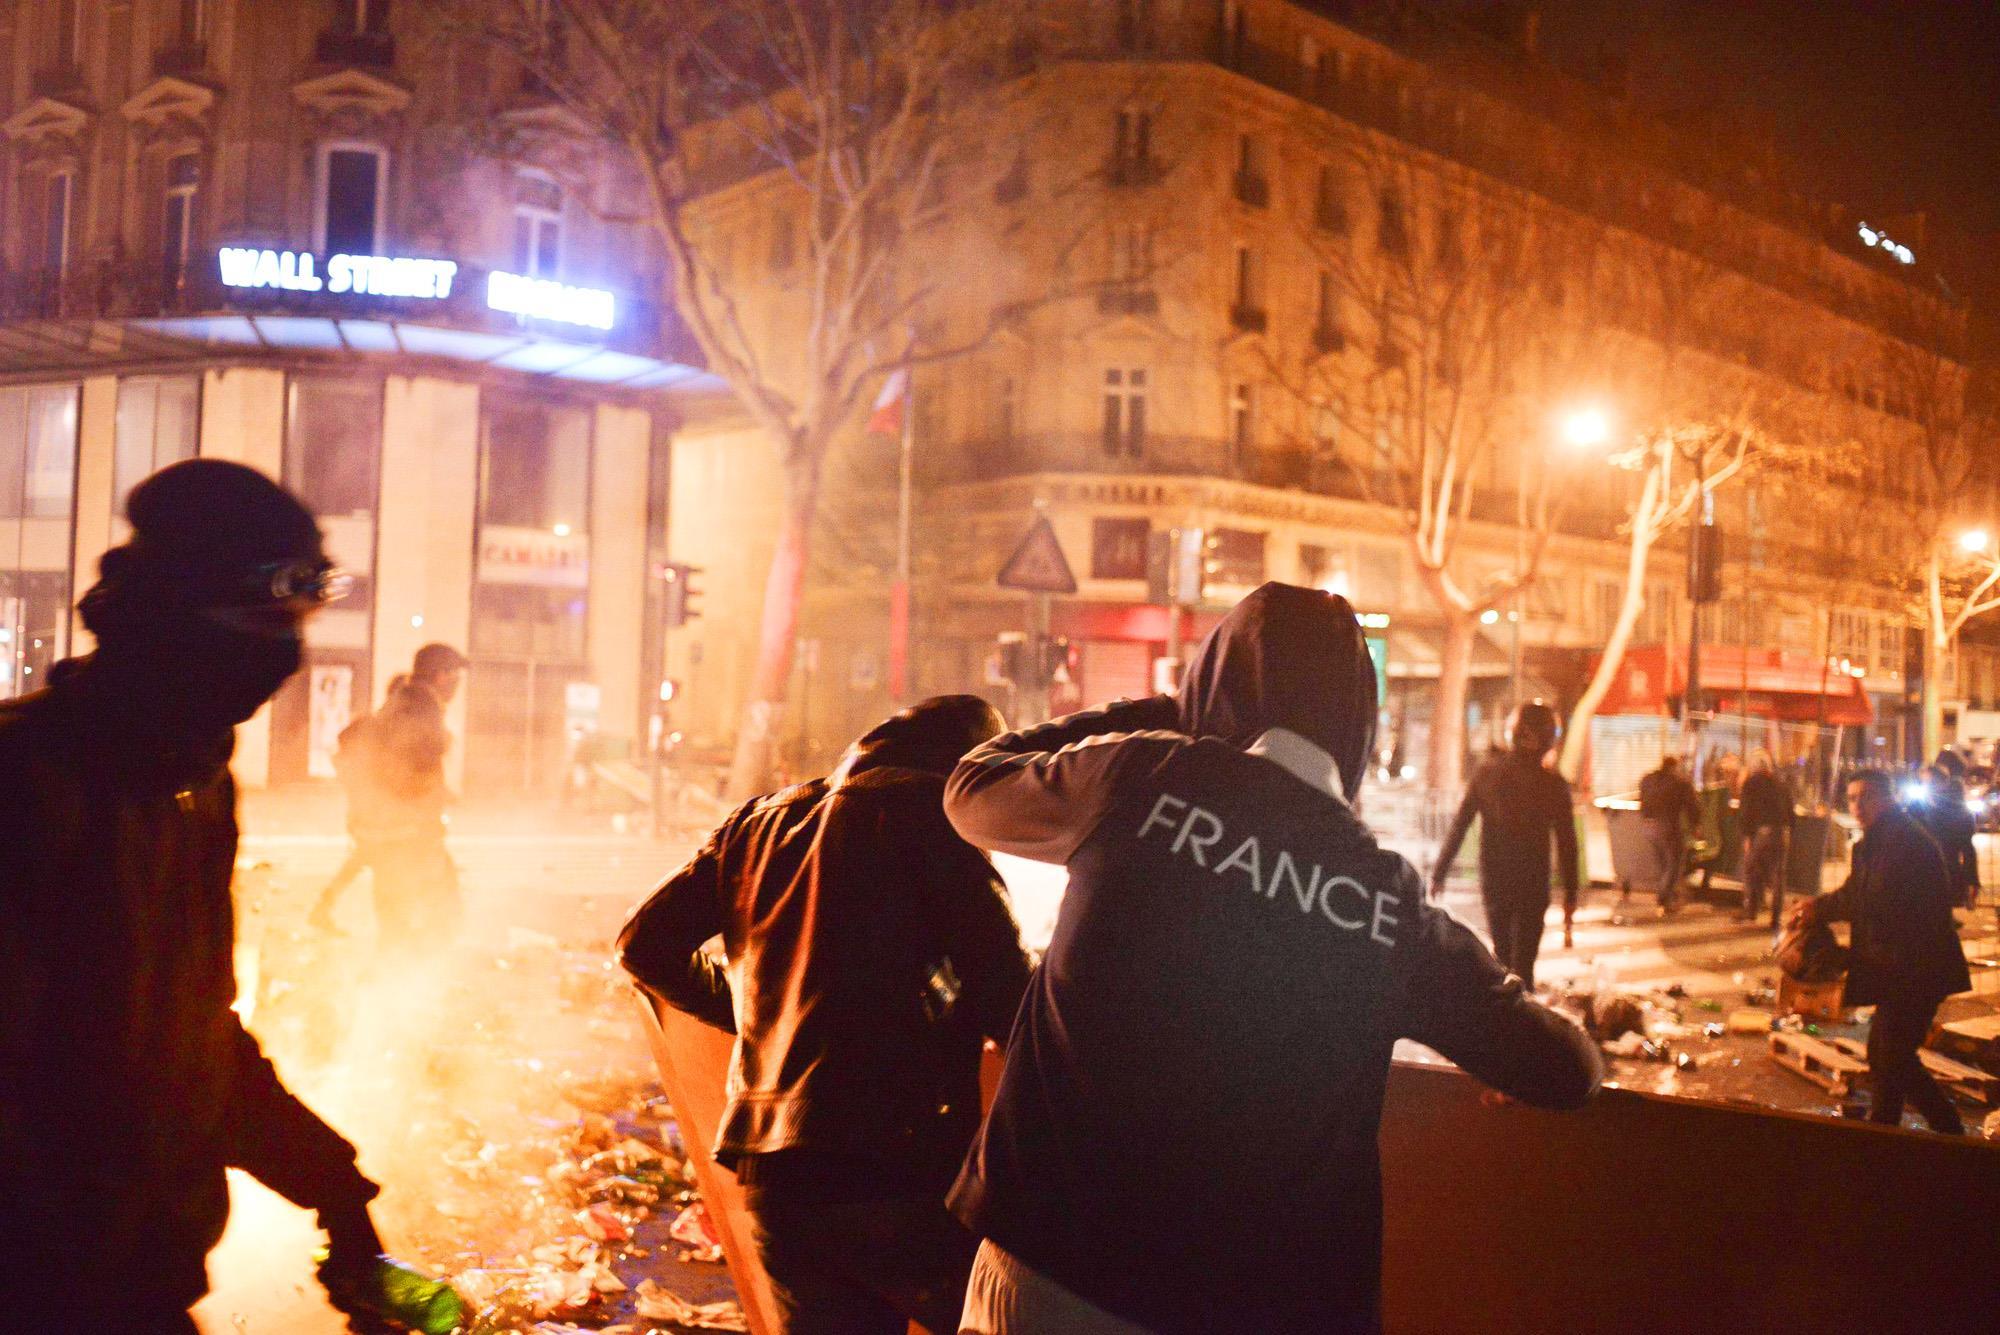 Во Франции проходят протесты против роста цен на бензин